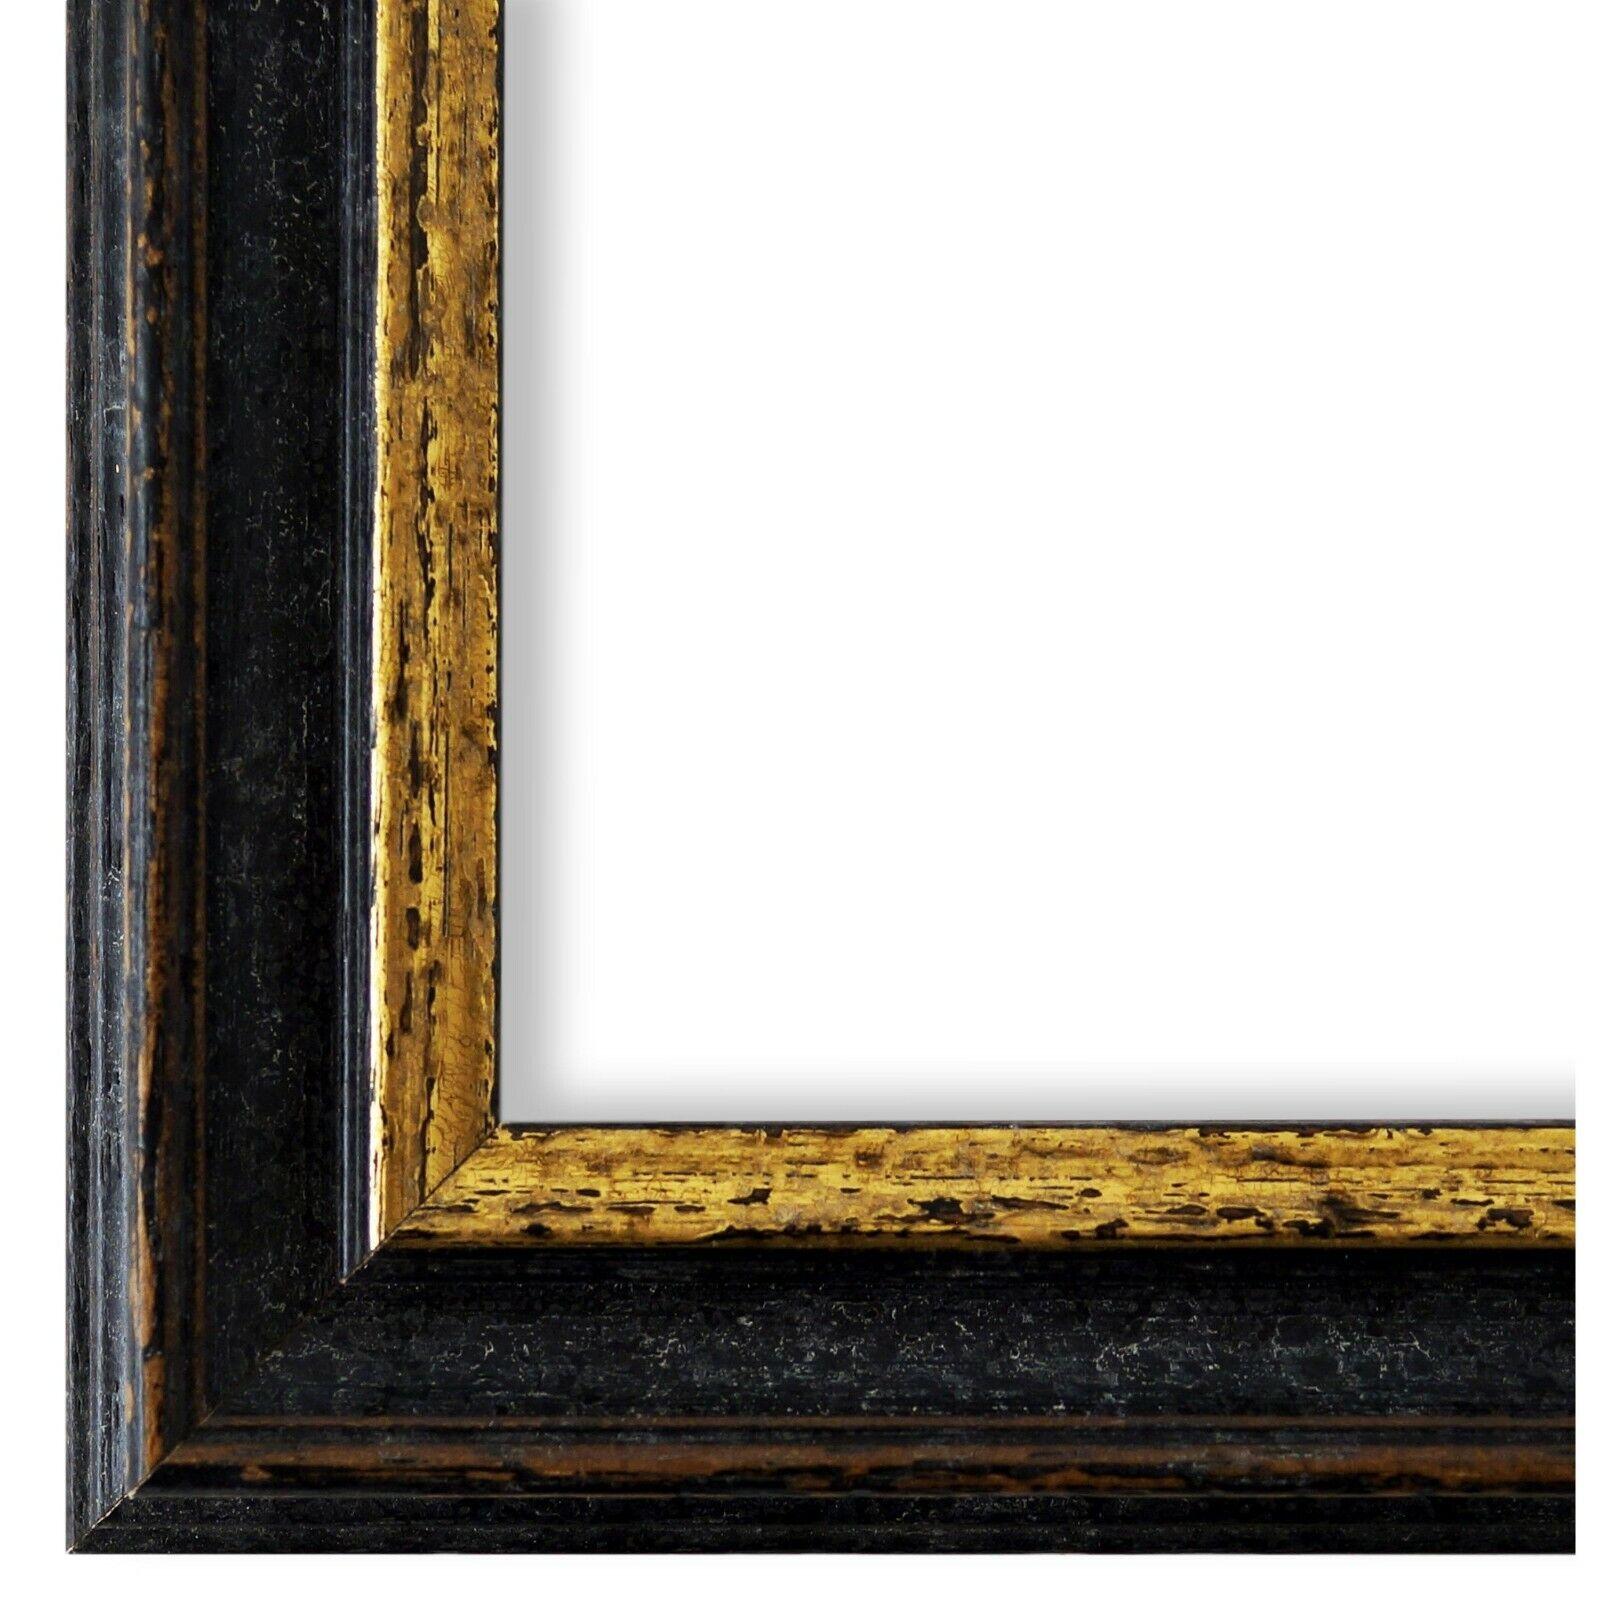 Bilderrahmen Forli Schwarz Gold - 80x80 80x90 80x100 80x120 90x90 90x100 100x100